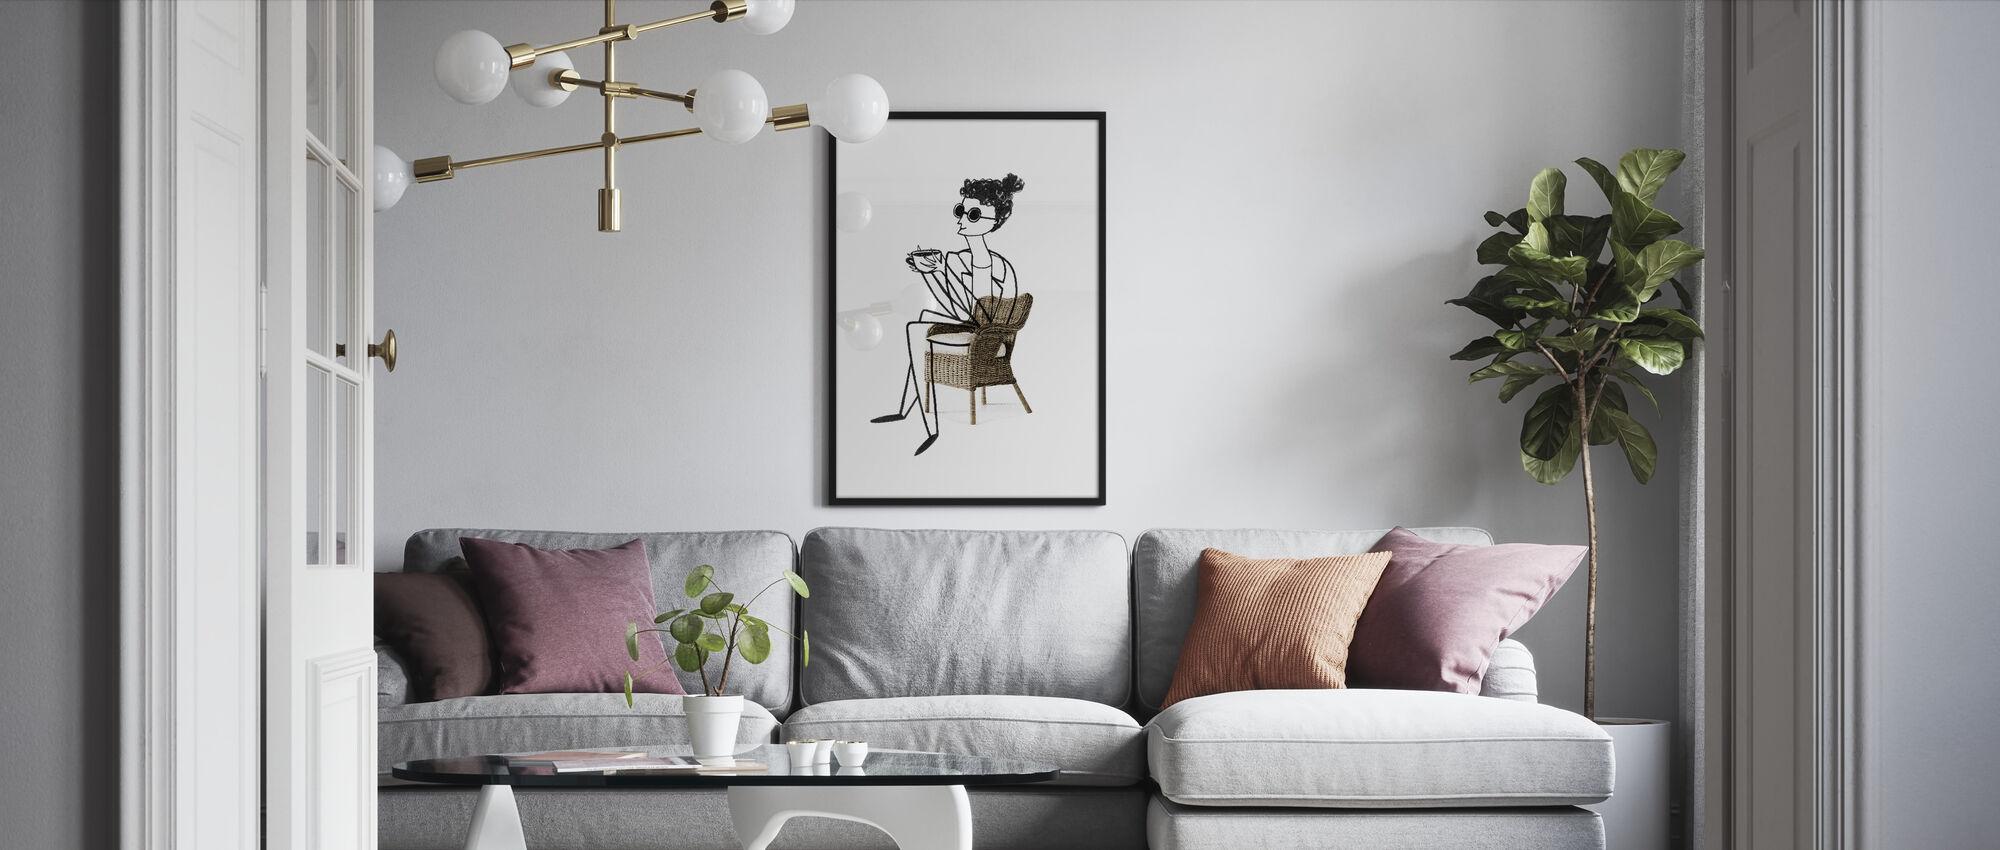 Woman Drinking Coffee - Framed print - Living Room